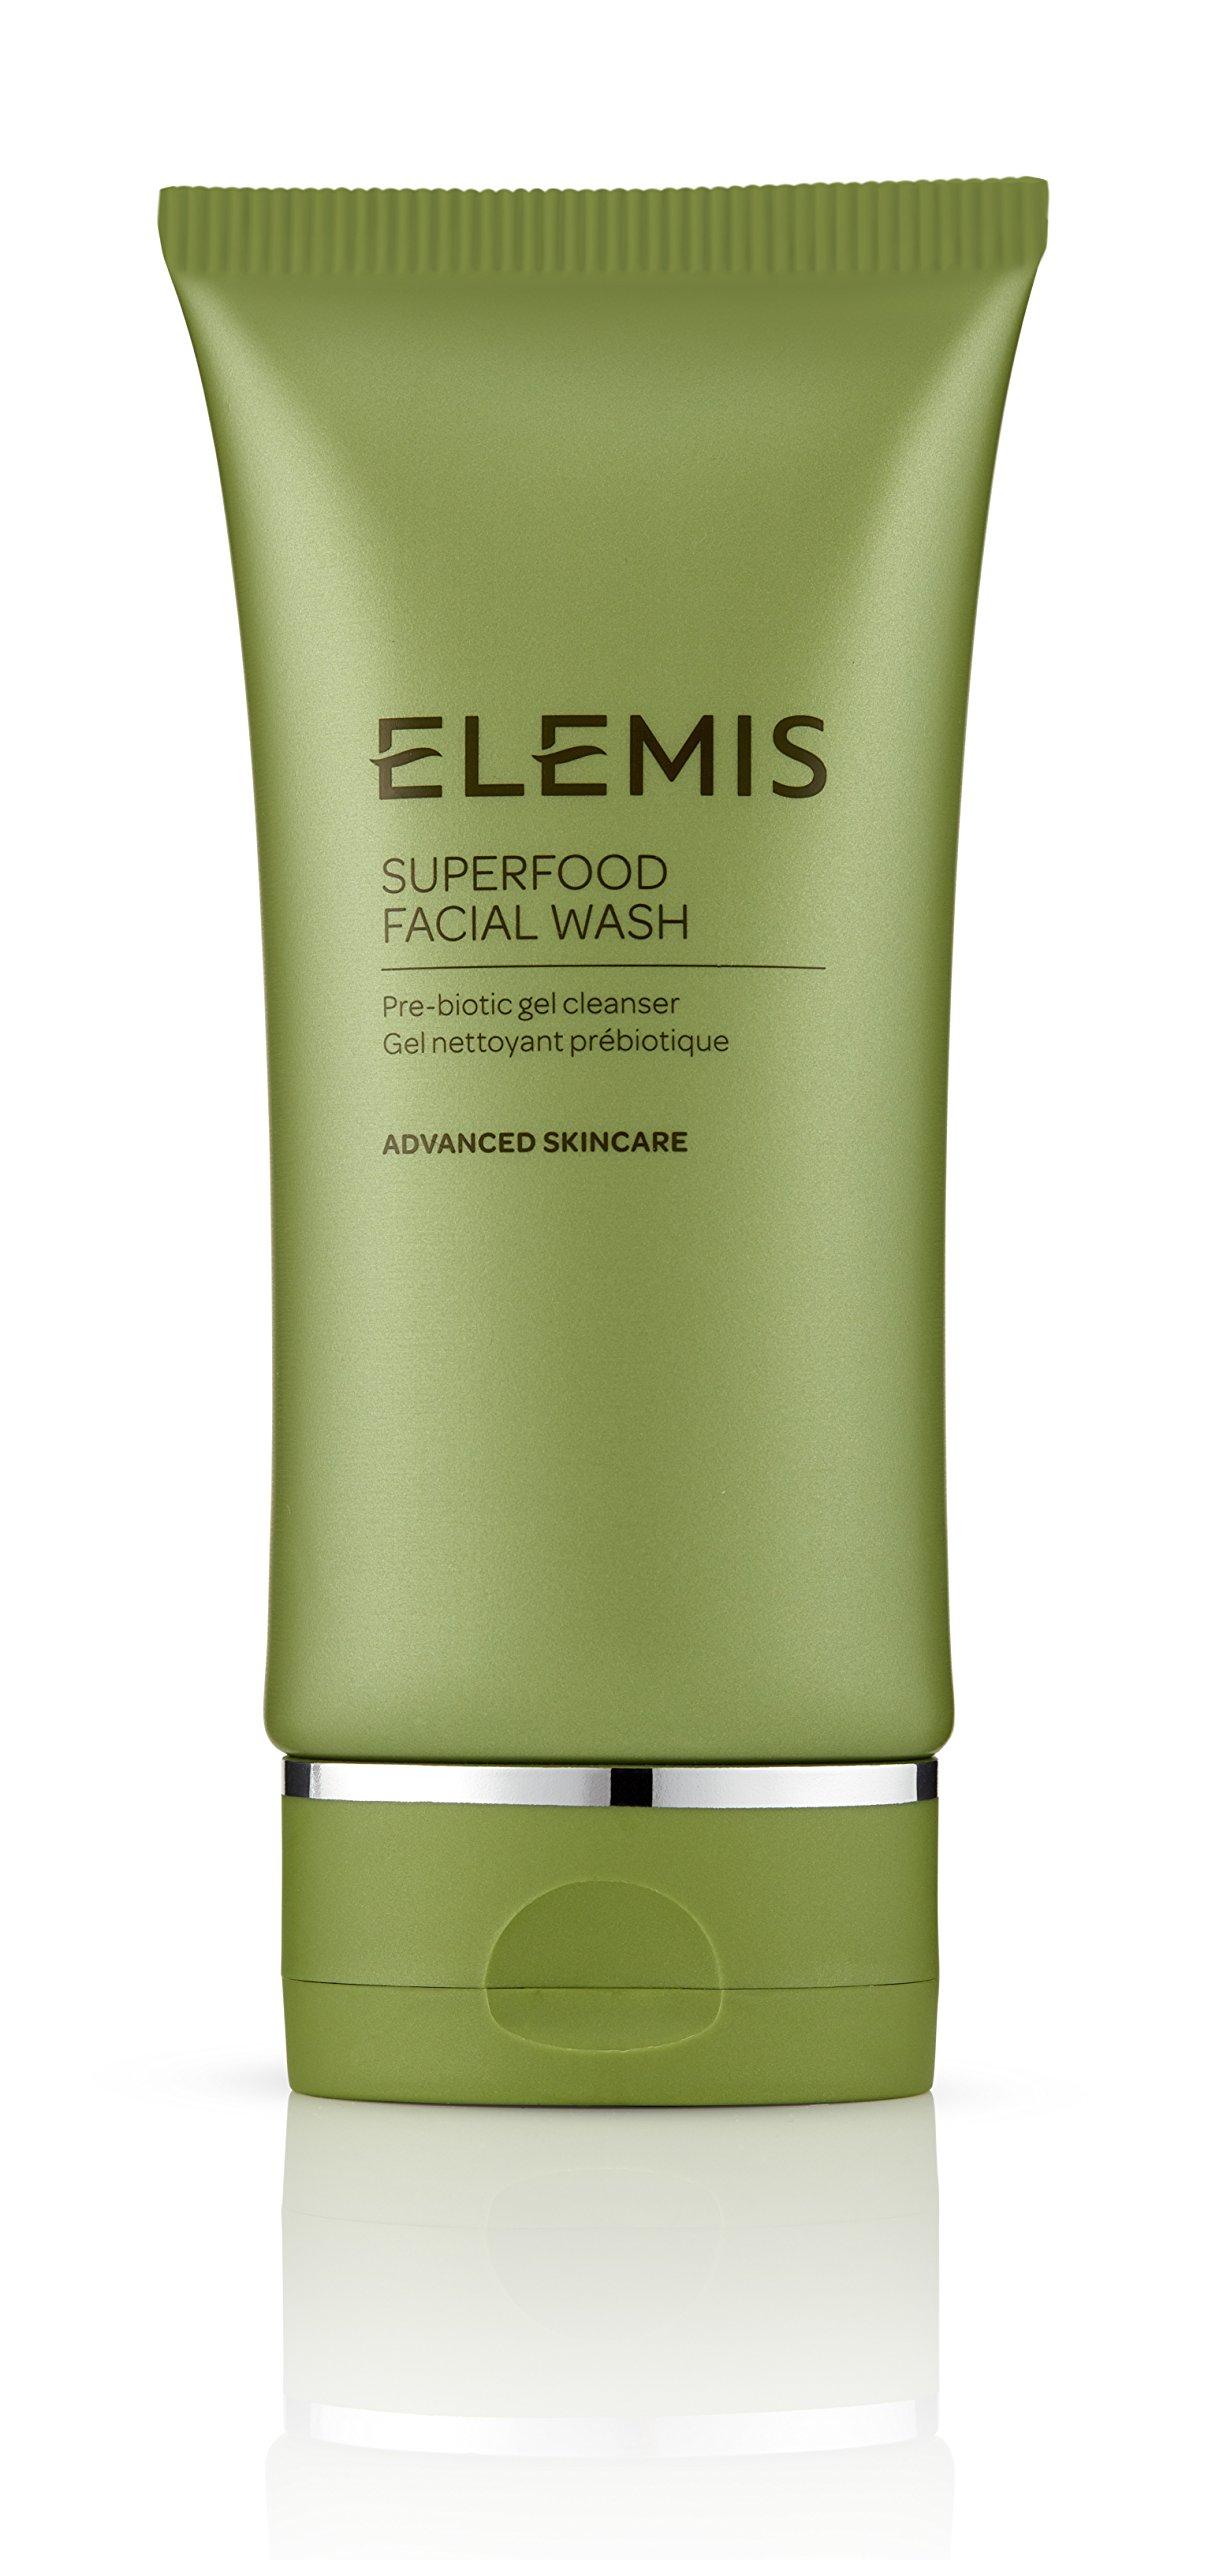 Elemis - ELEMIS Superfood Facial Wash - Nourishing, Nutrient-dense Gel Cleanser, 5 fl. oz.